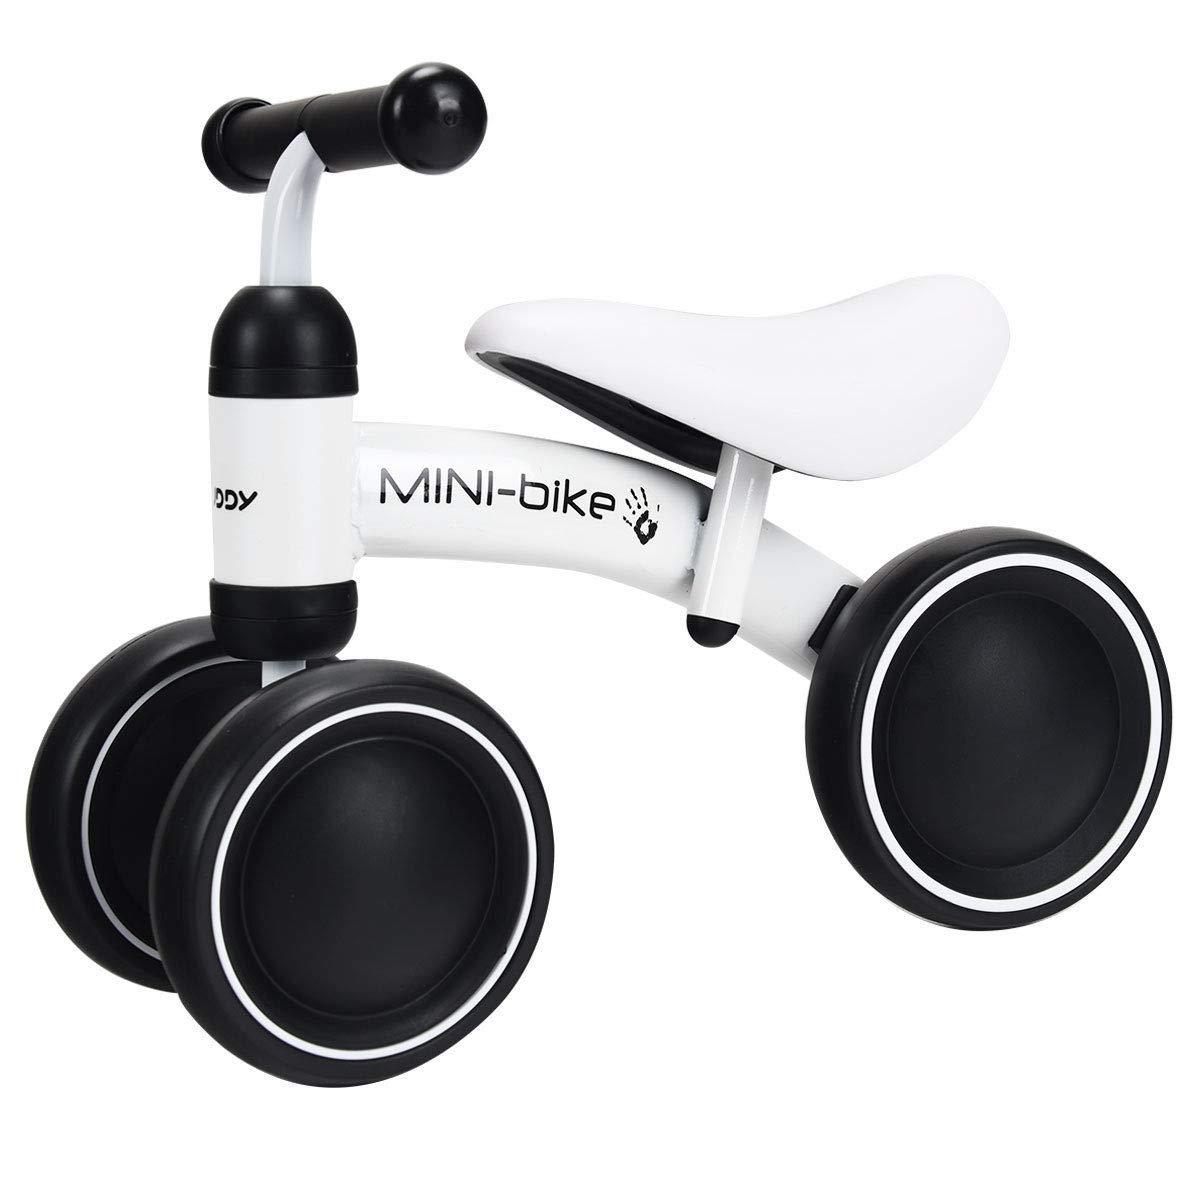 Costzon Baby Balance Bikes, Mini Bike Bicycle, Children Walker Toys Rides for 18-36 Months No Pedal Infant 3 Wheels Toddler Bike (White)